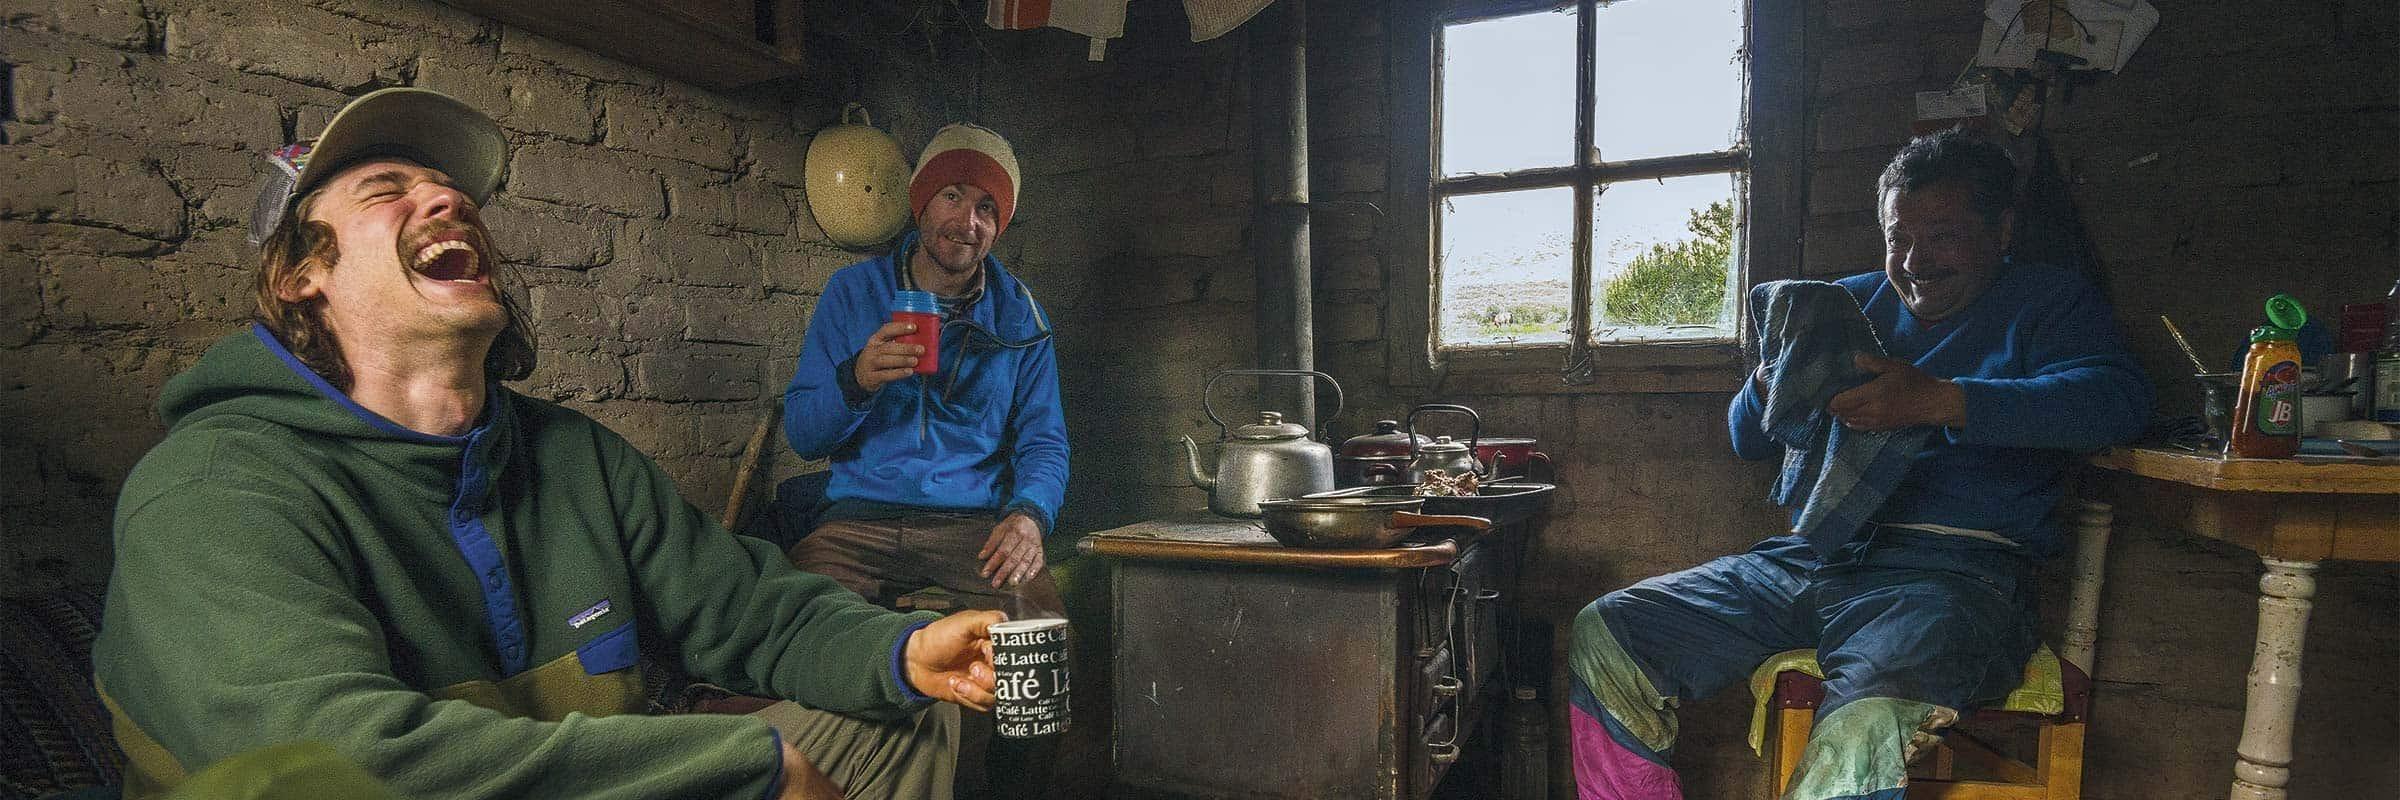 Patagonia Synchilla chandail équitable